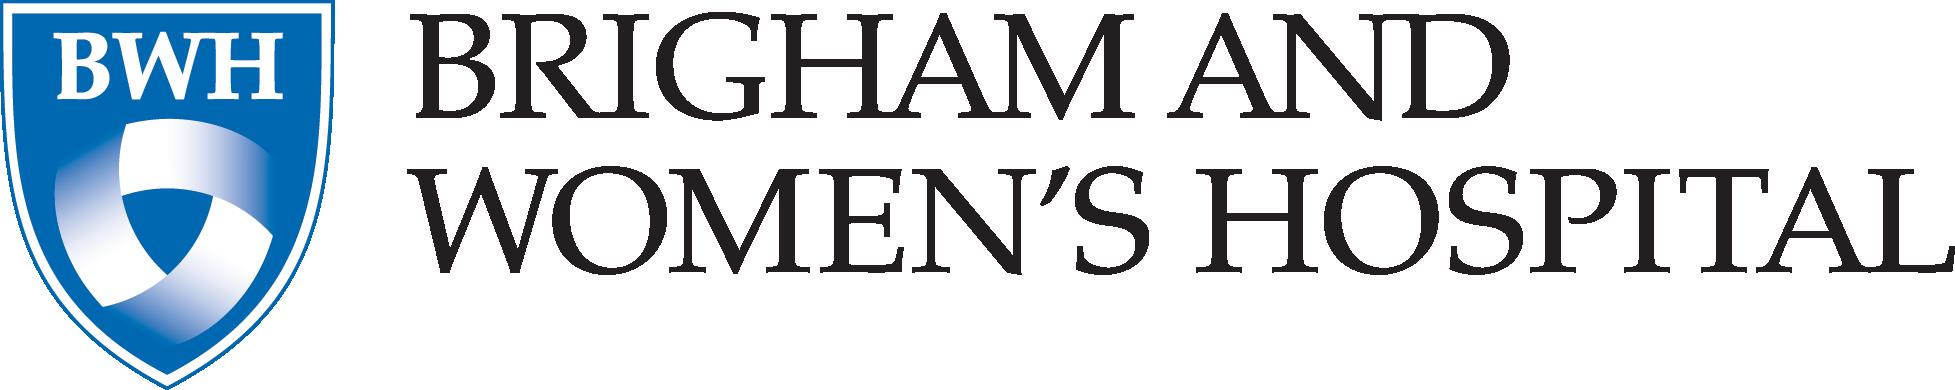 Brigham-&-Women's-Hospital.png